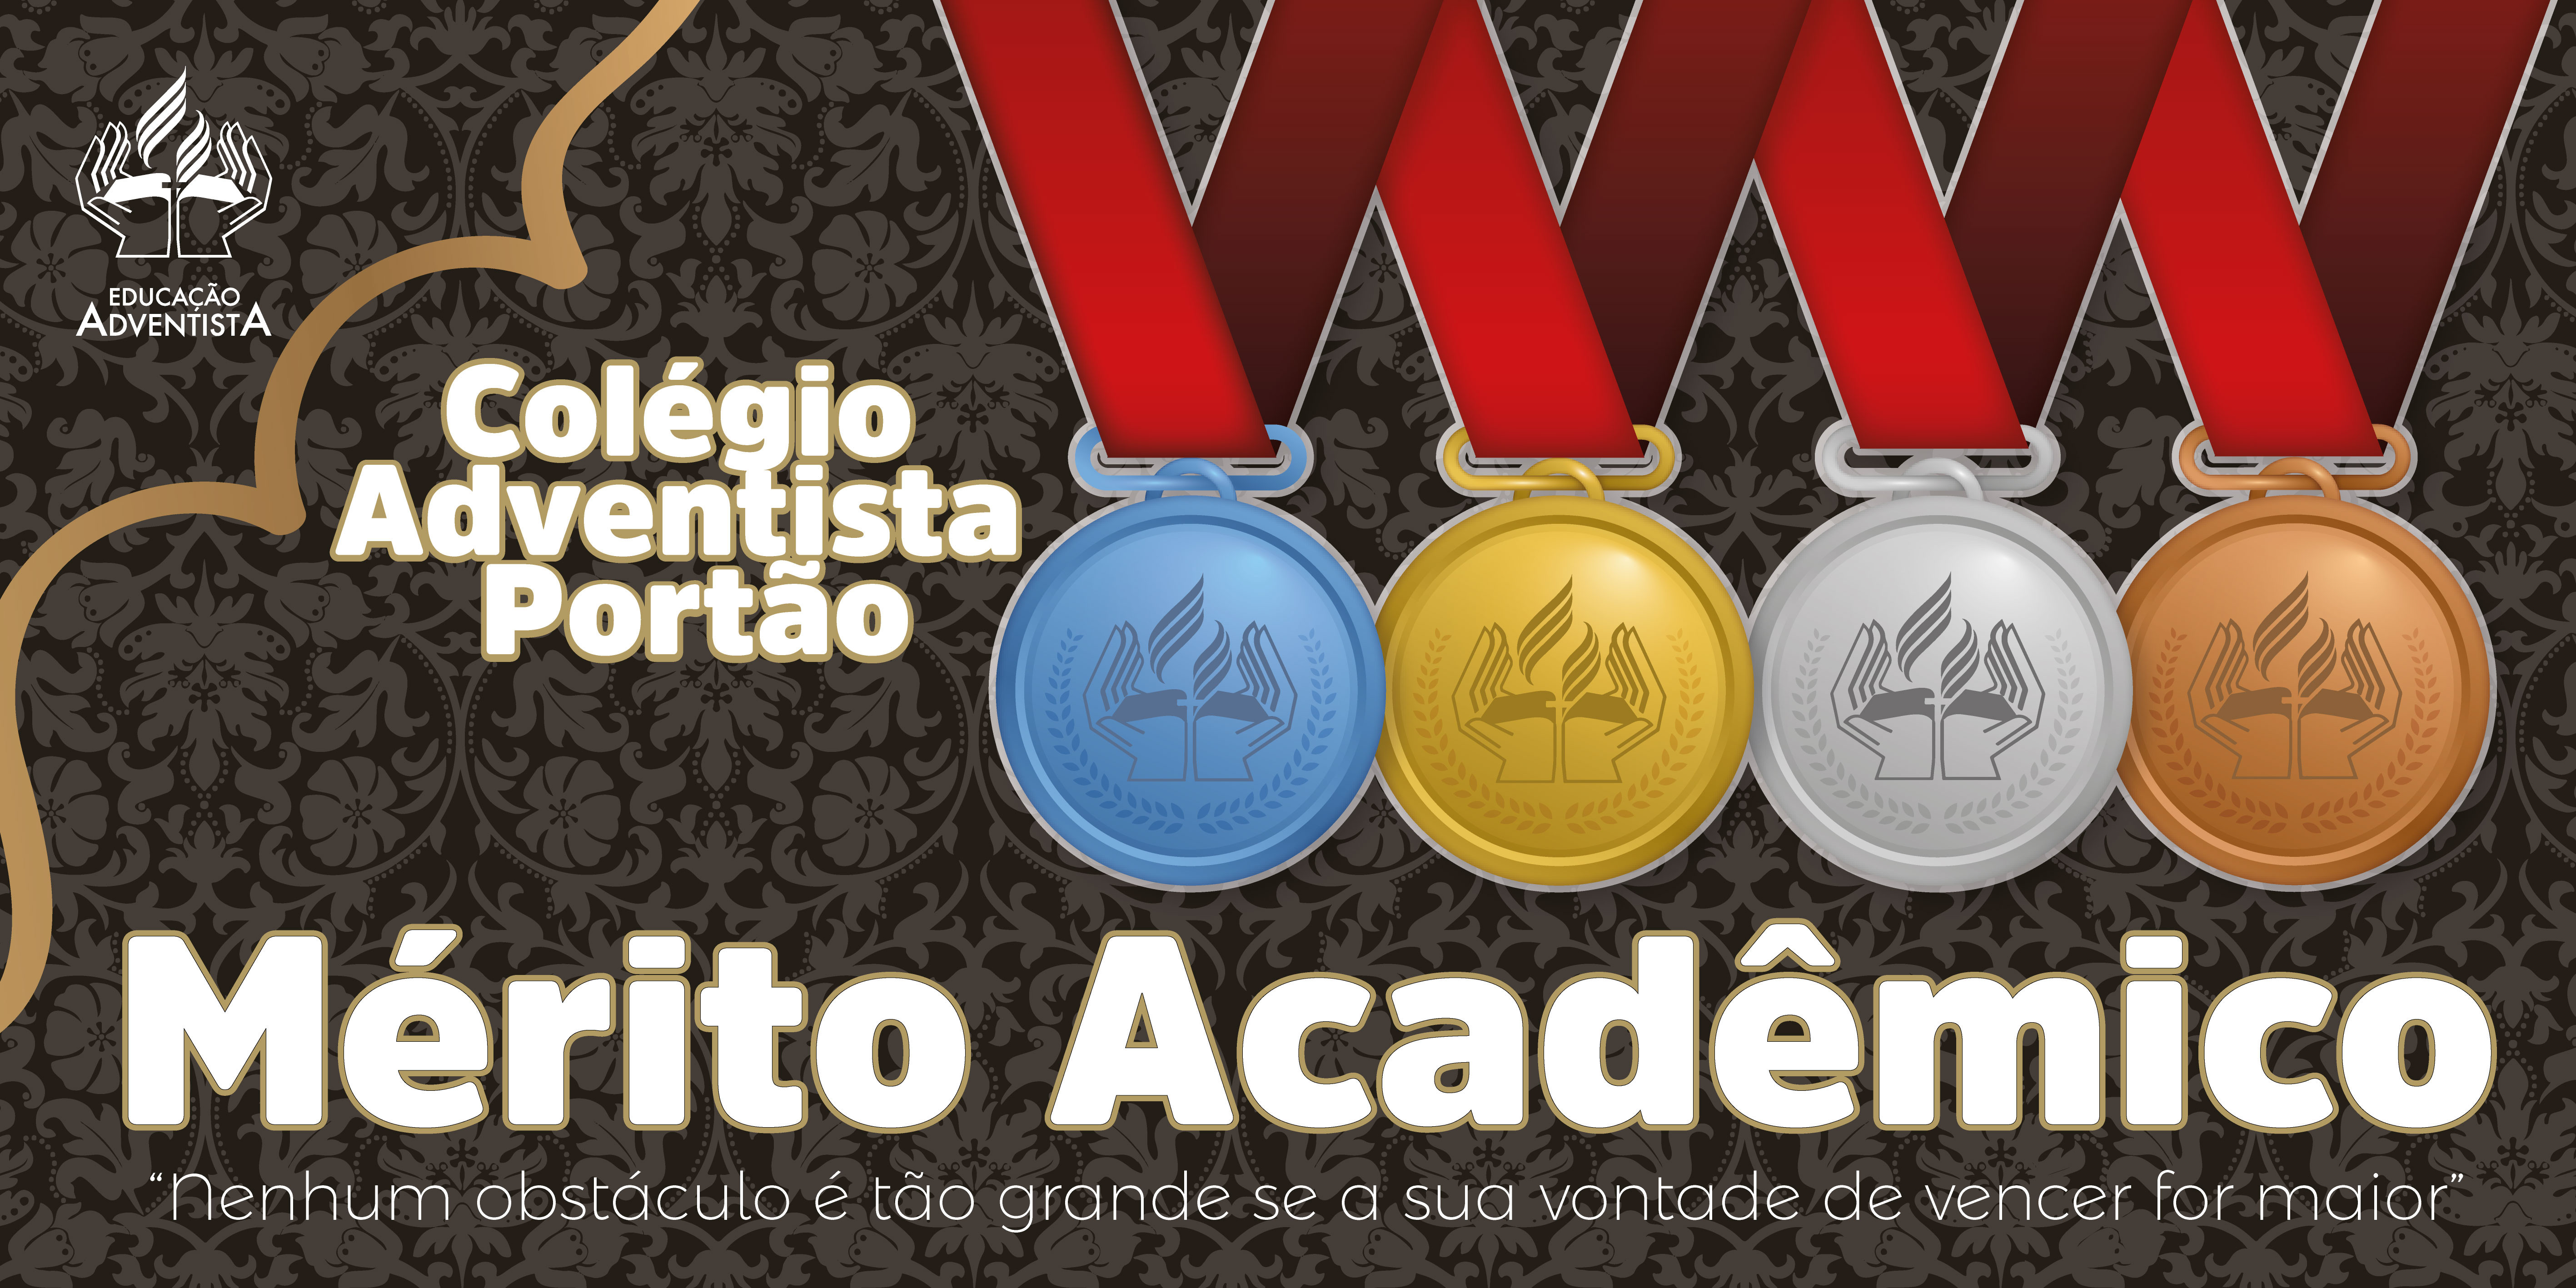 Mérito Acadêmico 2019